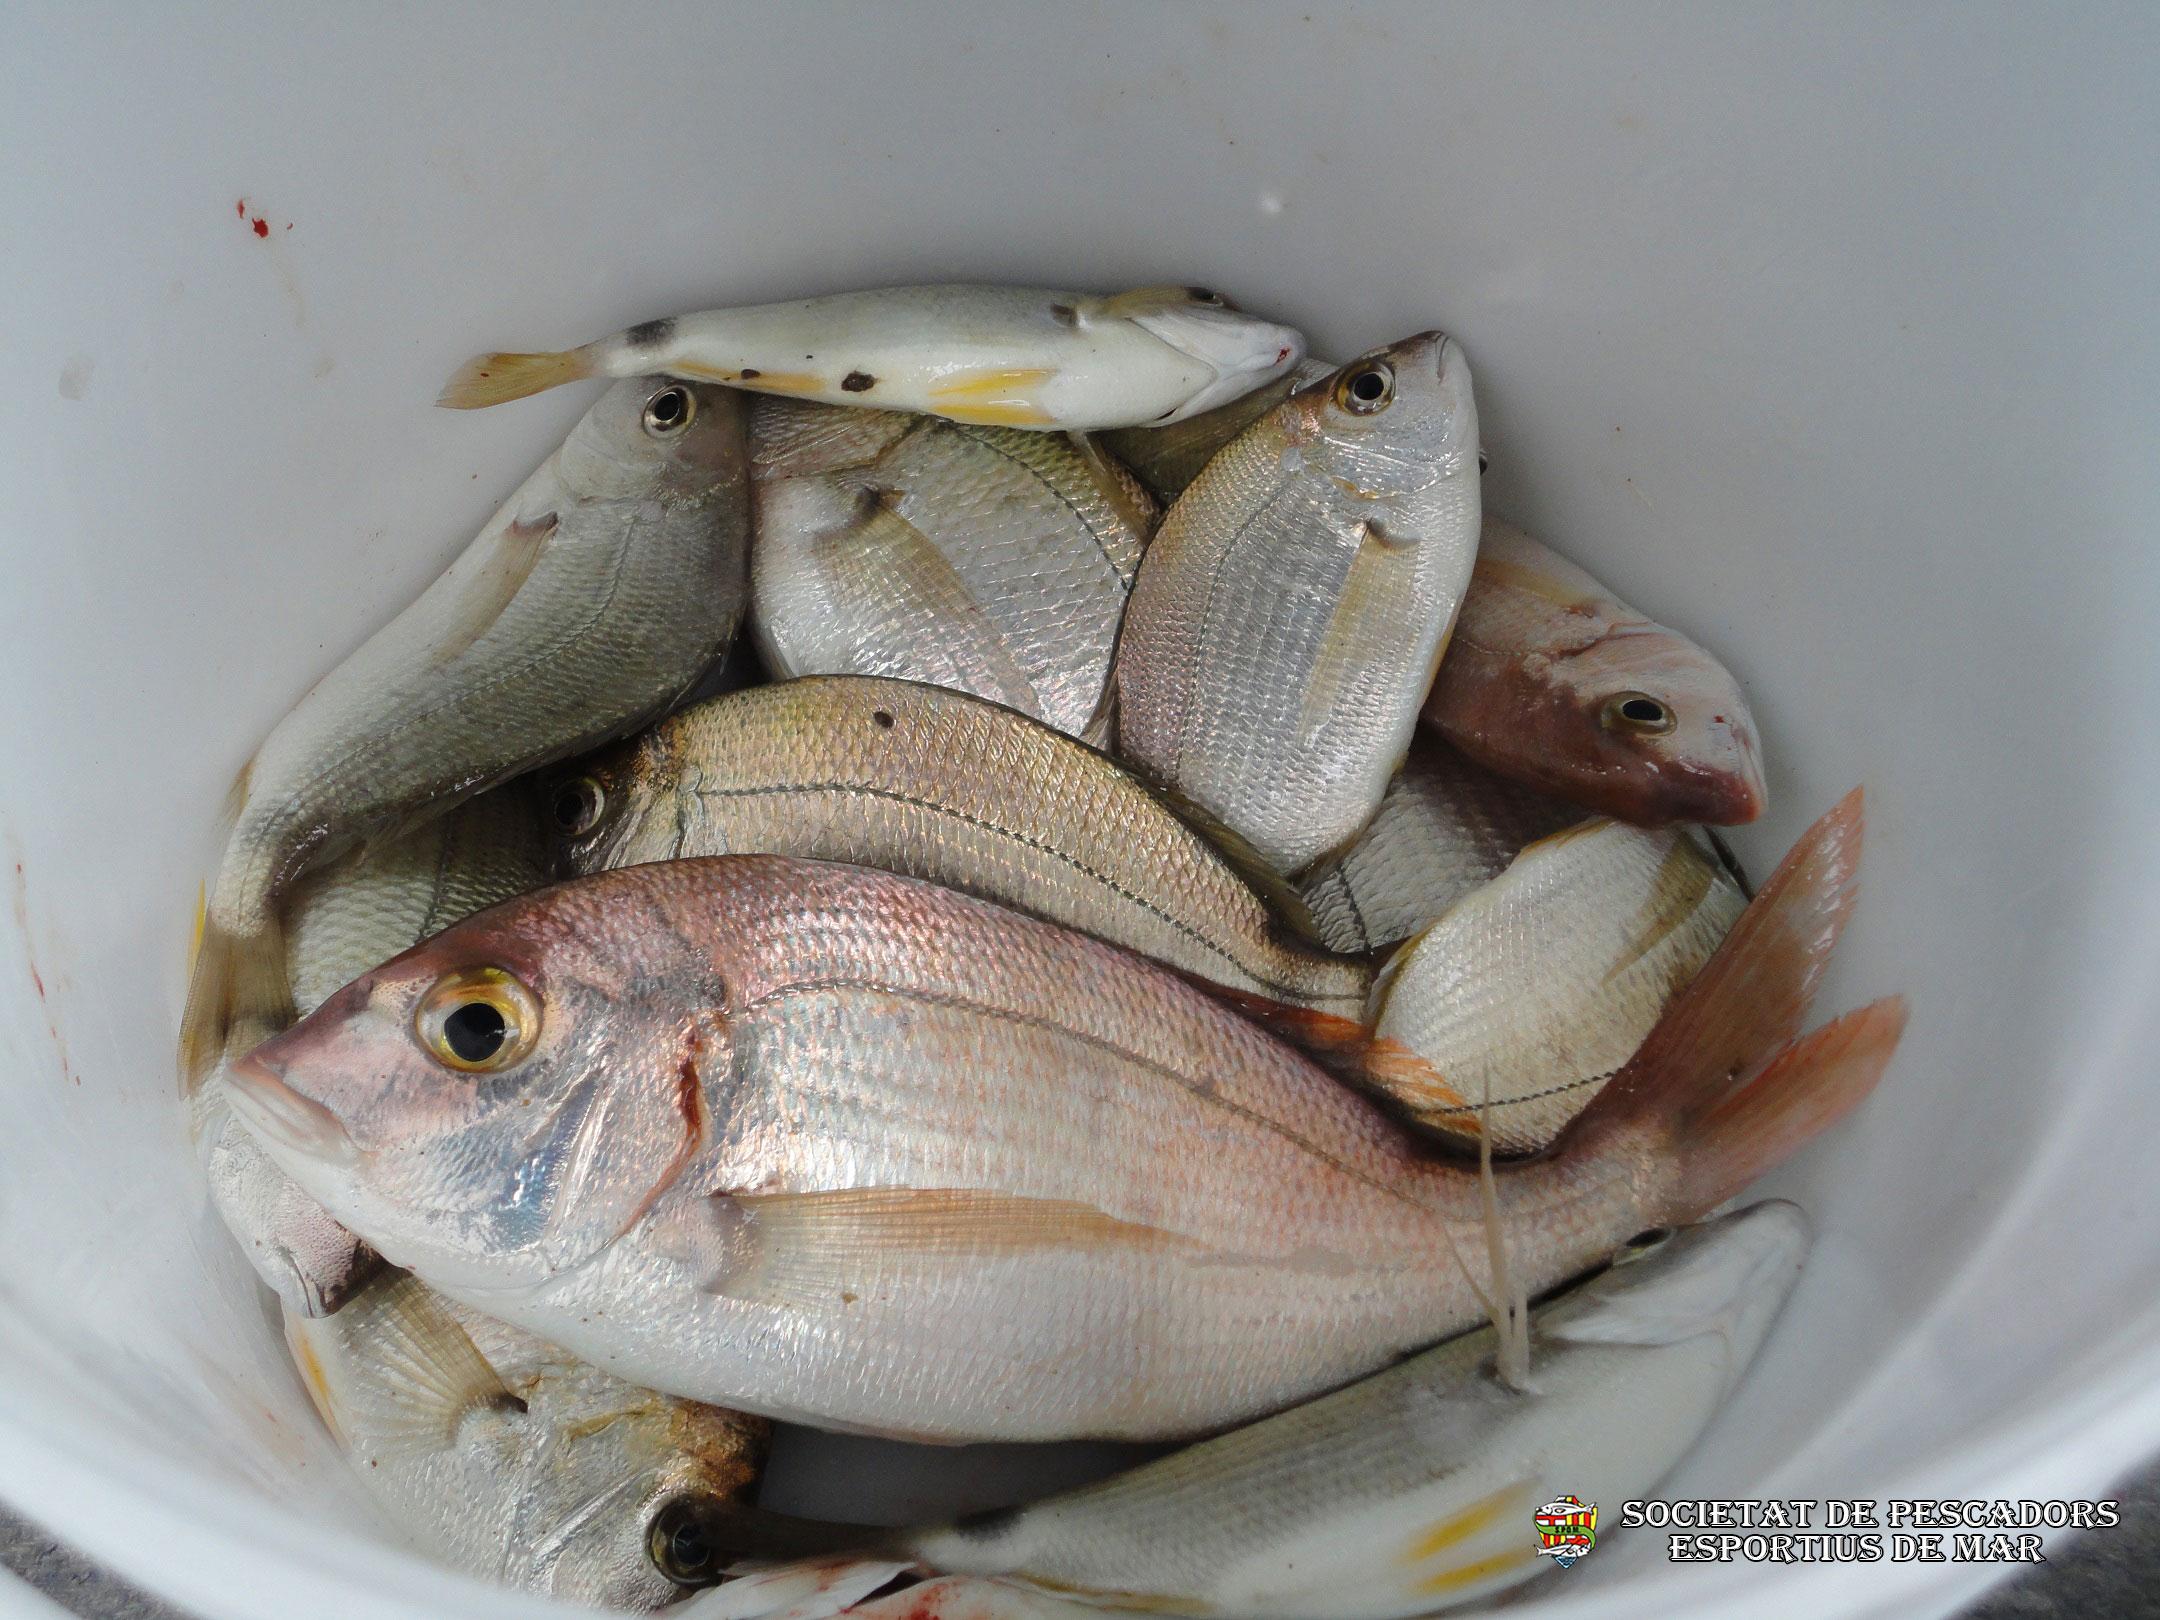 societat-de-pescadors-esportius-de-mar-barcelona-1123(www.societatpescadorsbarcelona